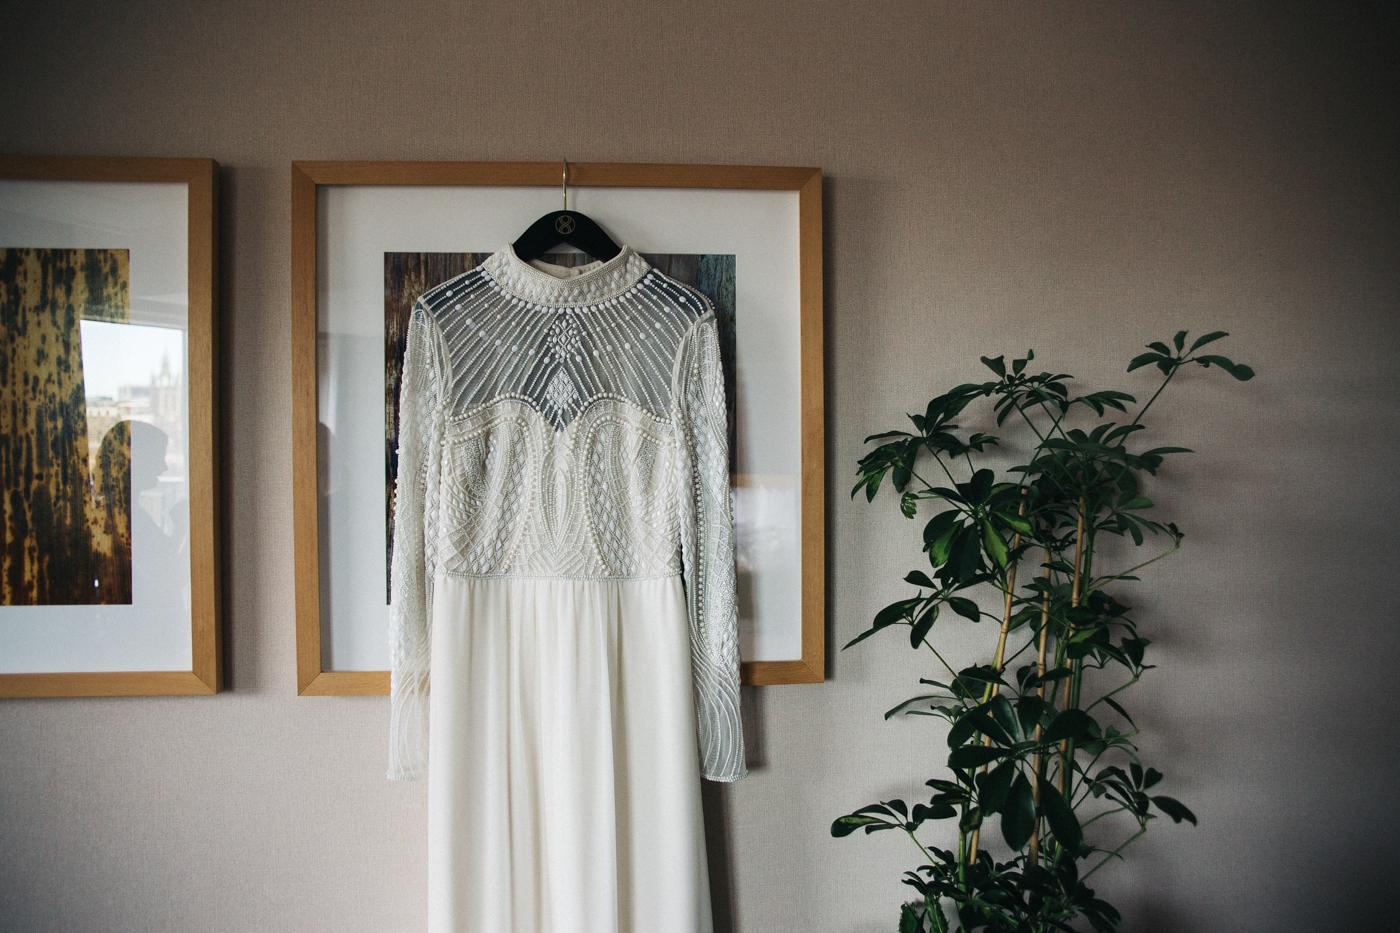 teesside-newcastle-gateshead-wedding-photography-photographer-creative-0004.jpg